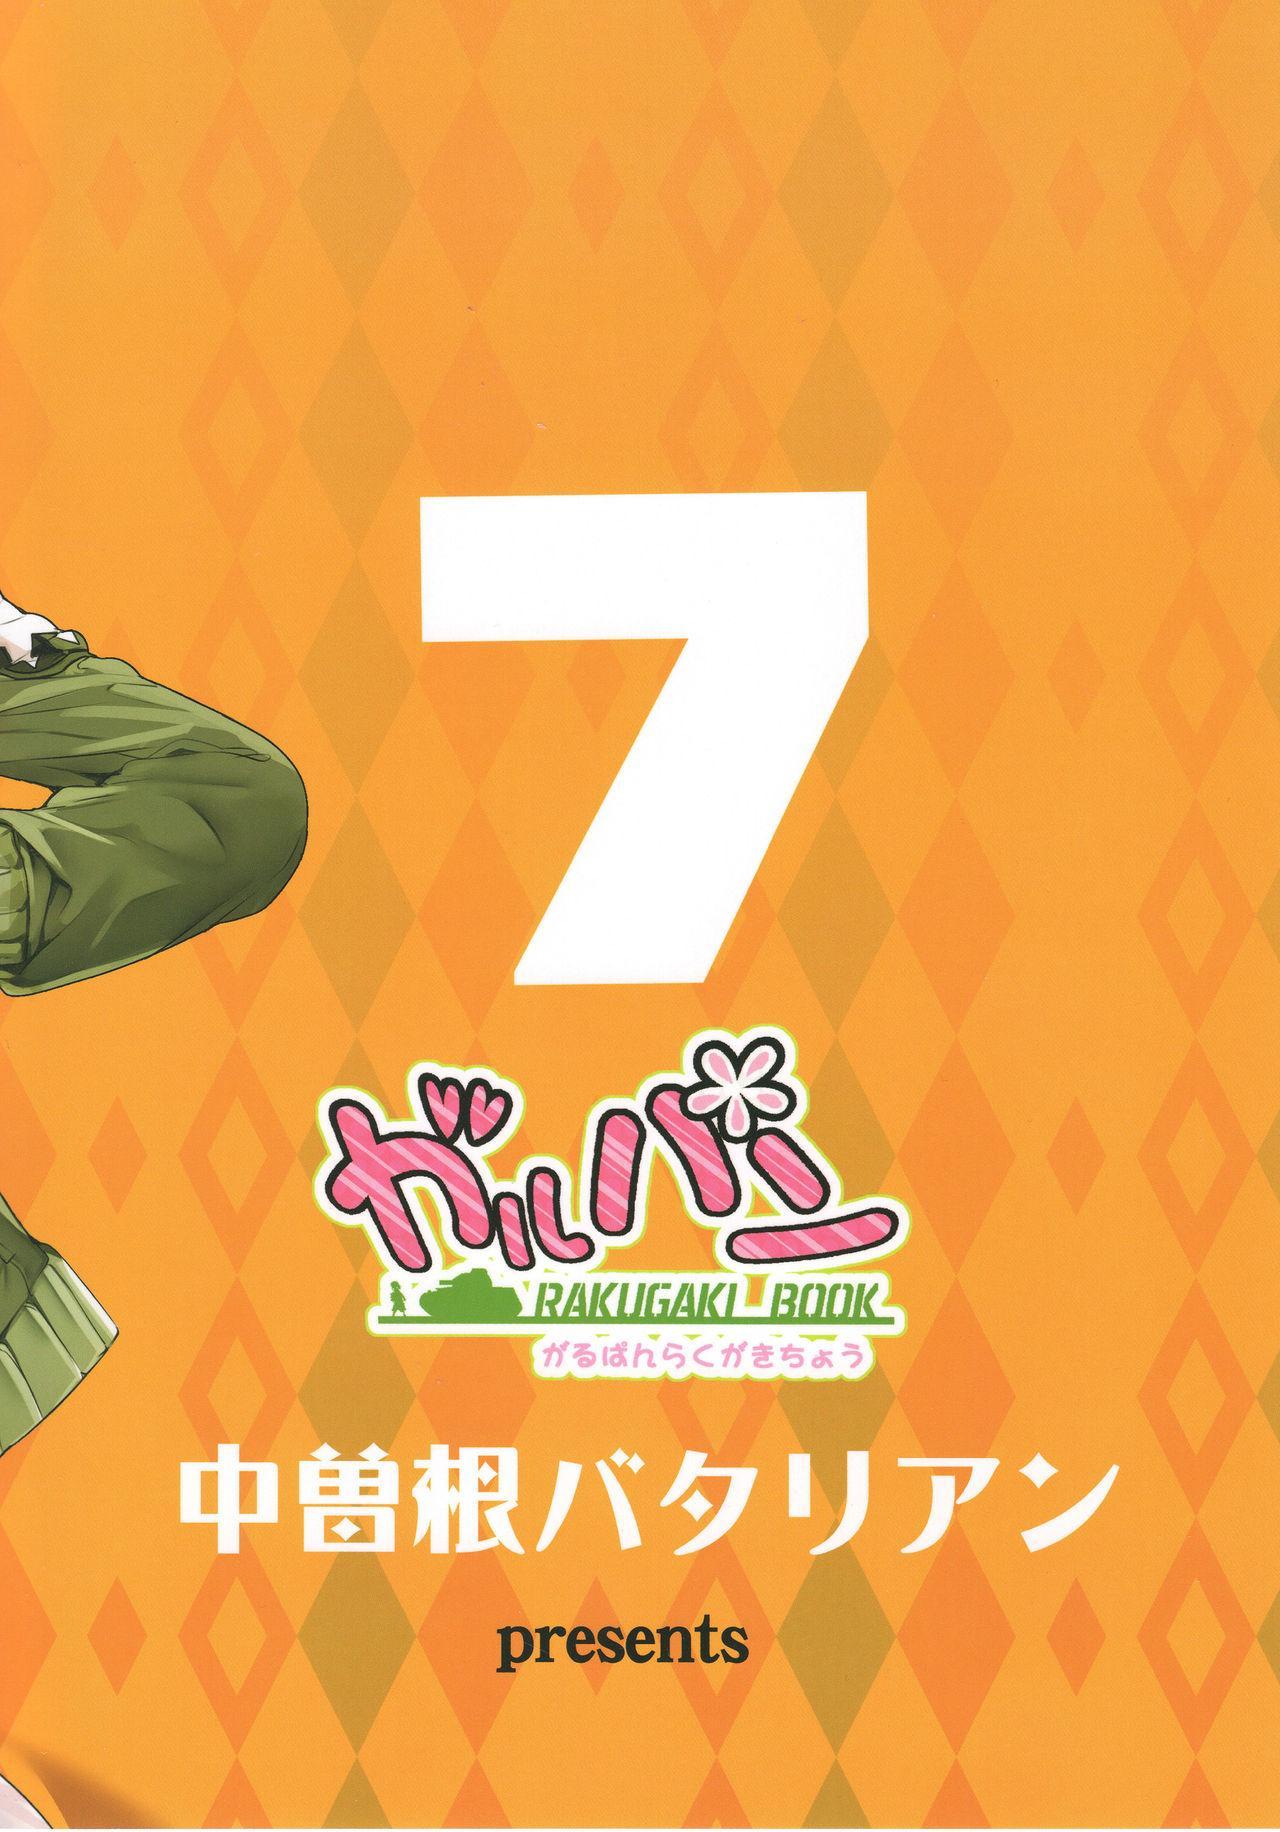 GirlPan Rakugakichou 7 25